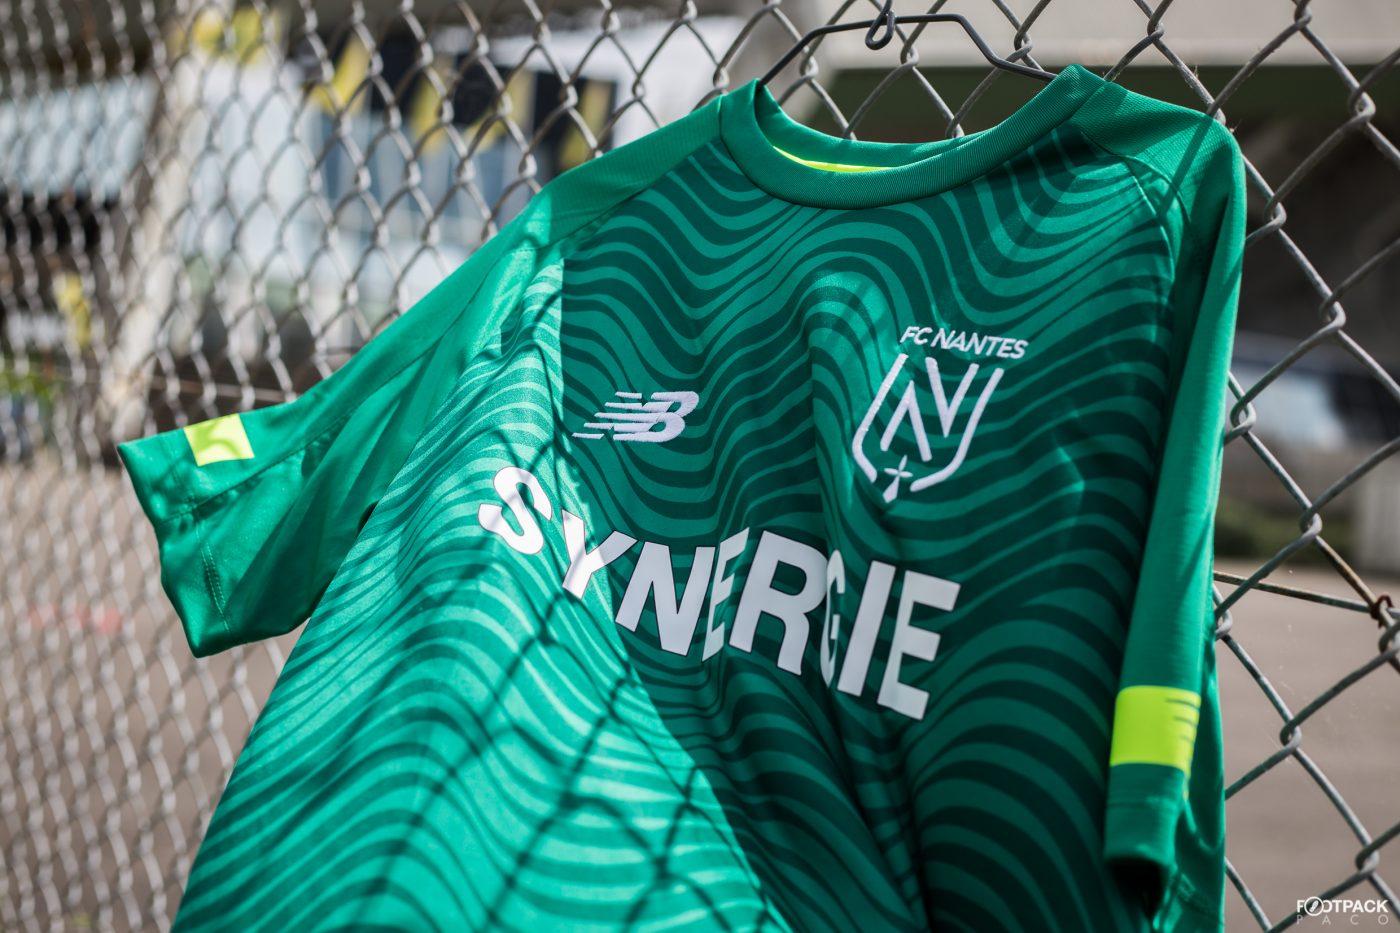 maillot-exterieur-fc-nantes-2019-2020-new-balance-footpack-4